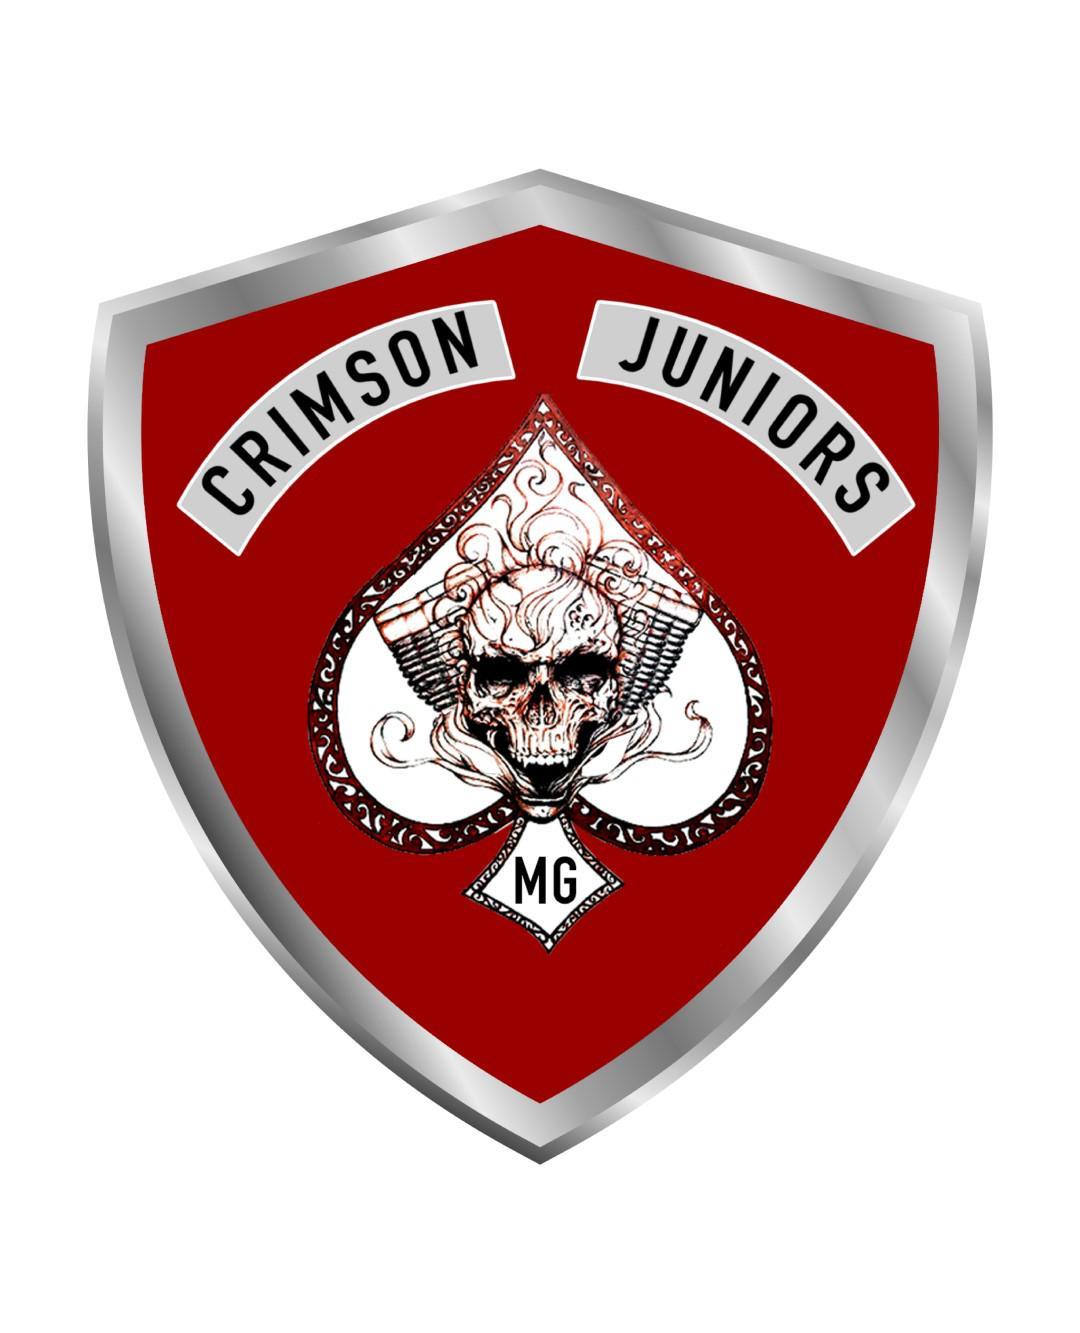 naissance-des-crimson-juniors-1332-1.jpg